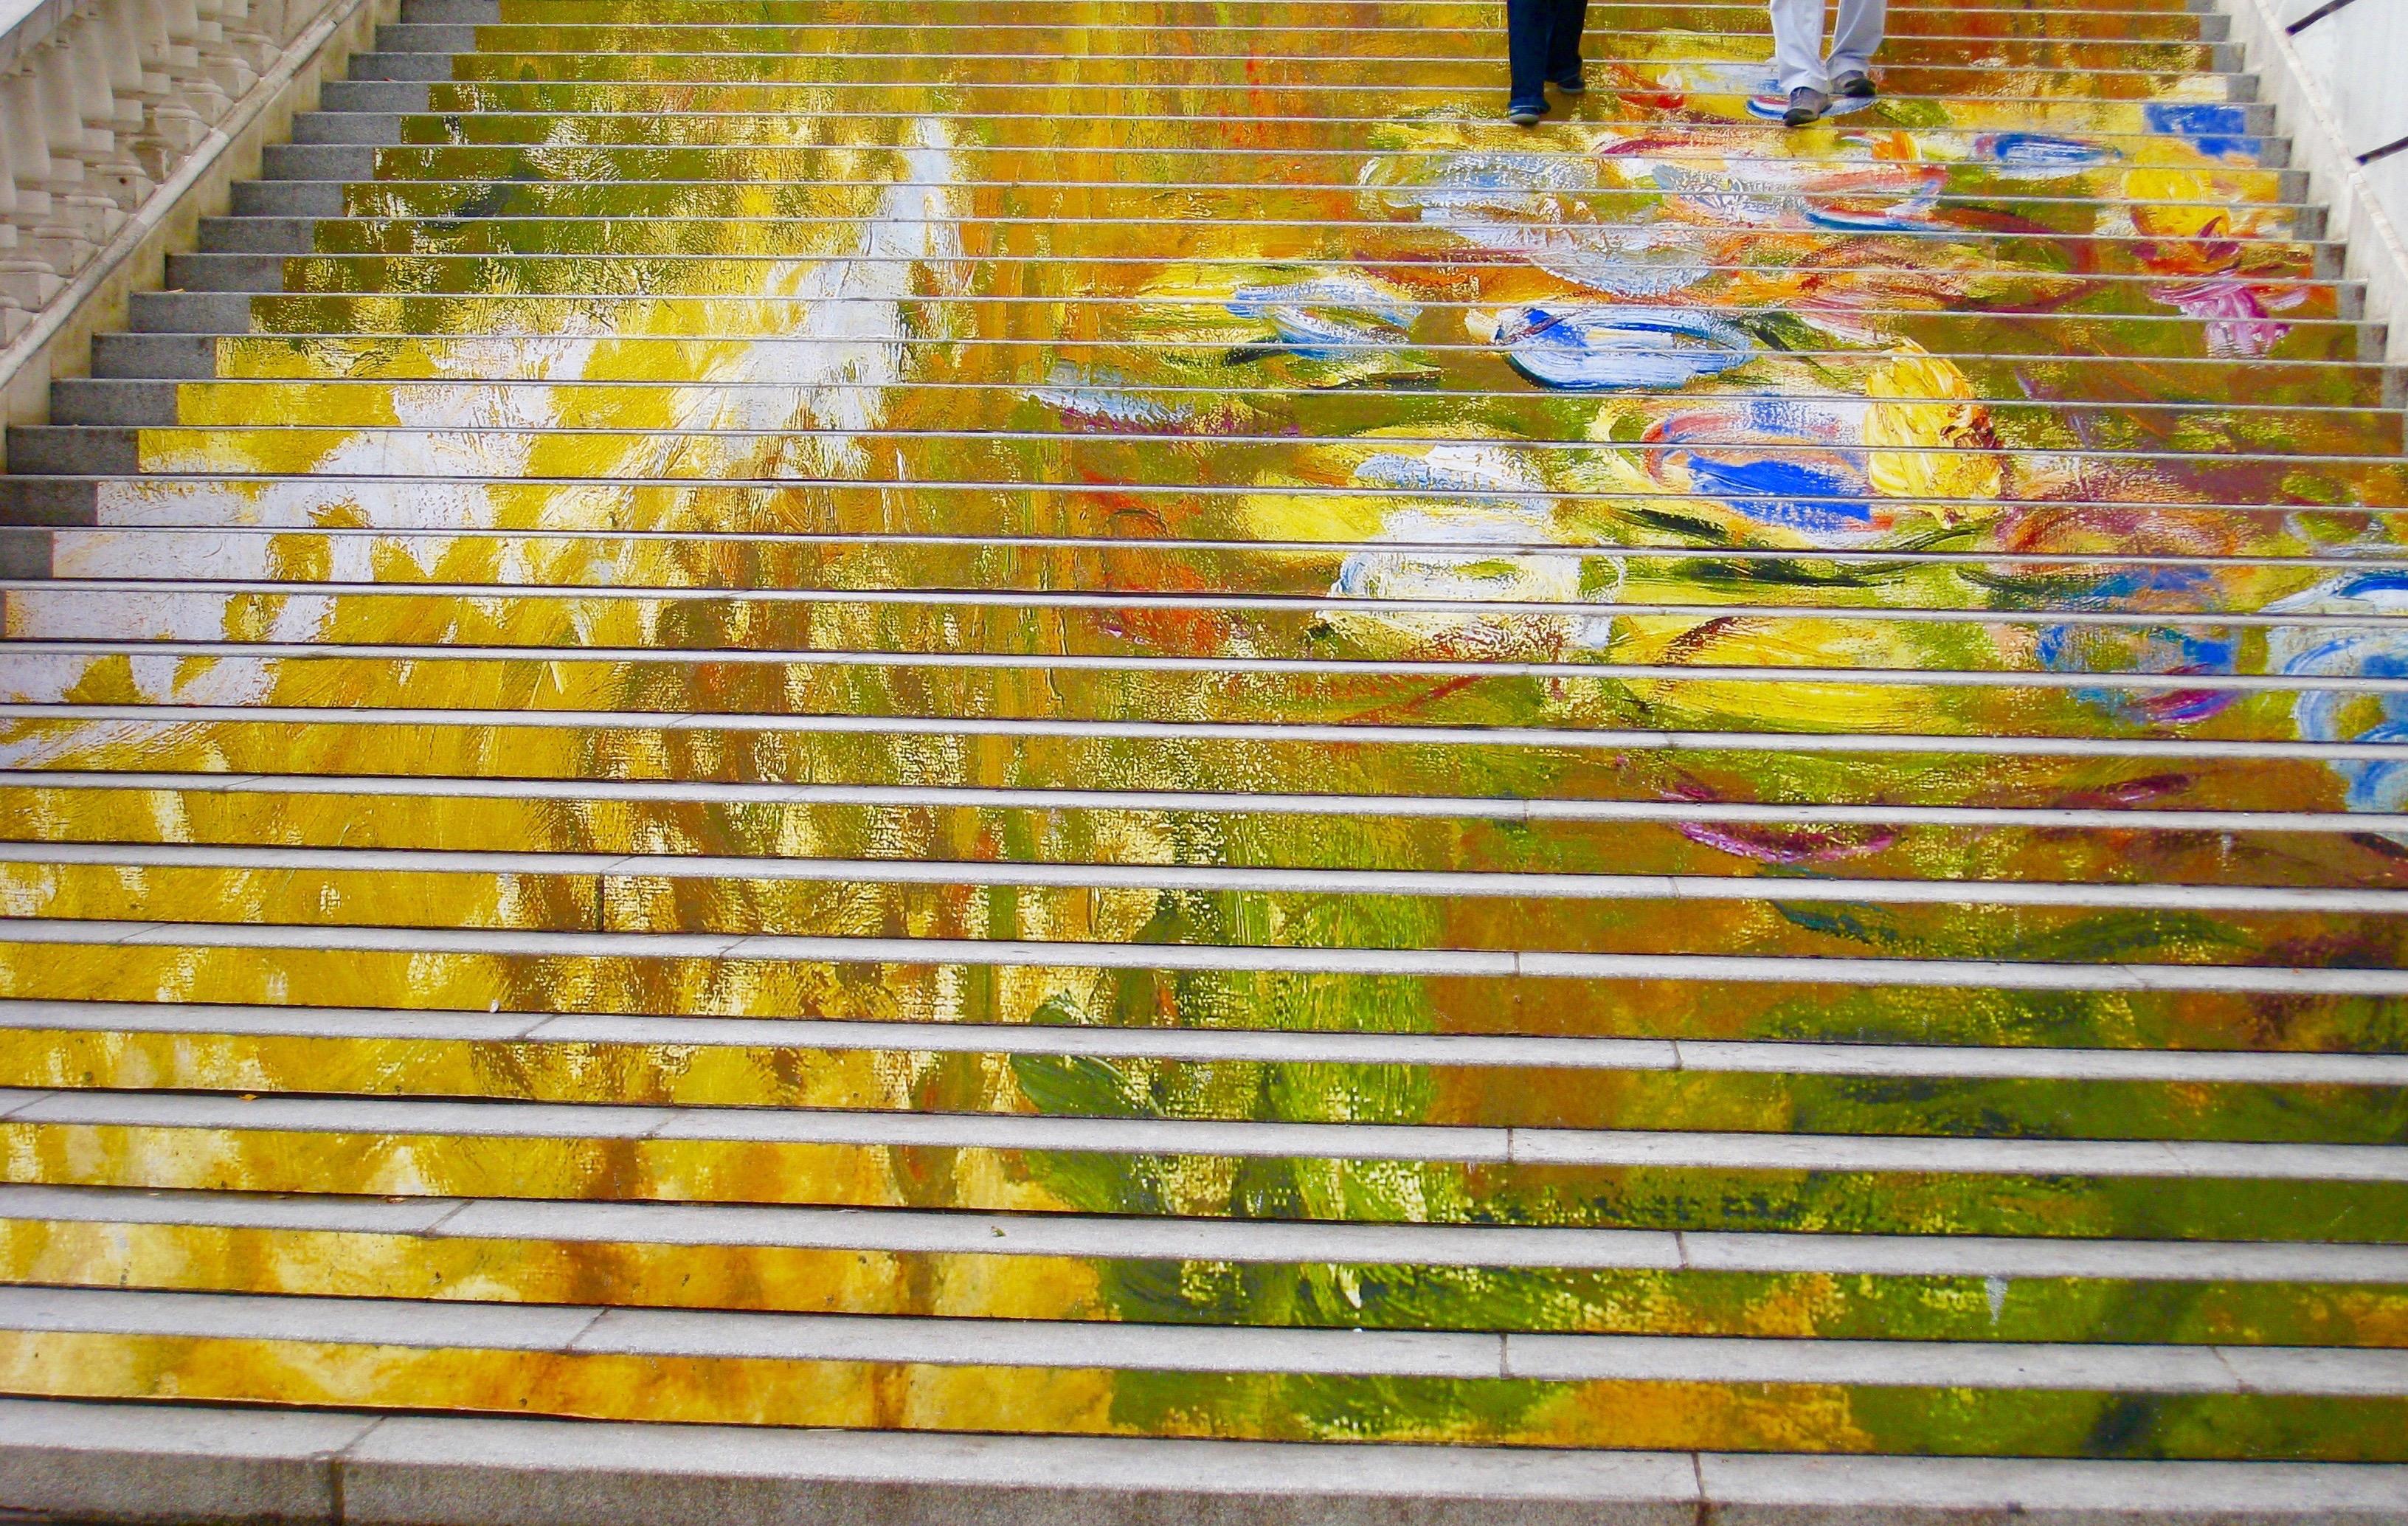 Vienna Painted Steps at Albertina Museum